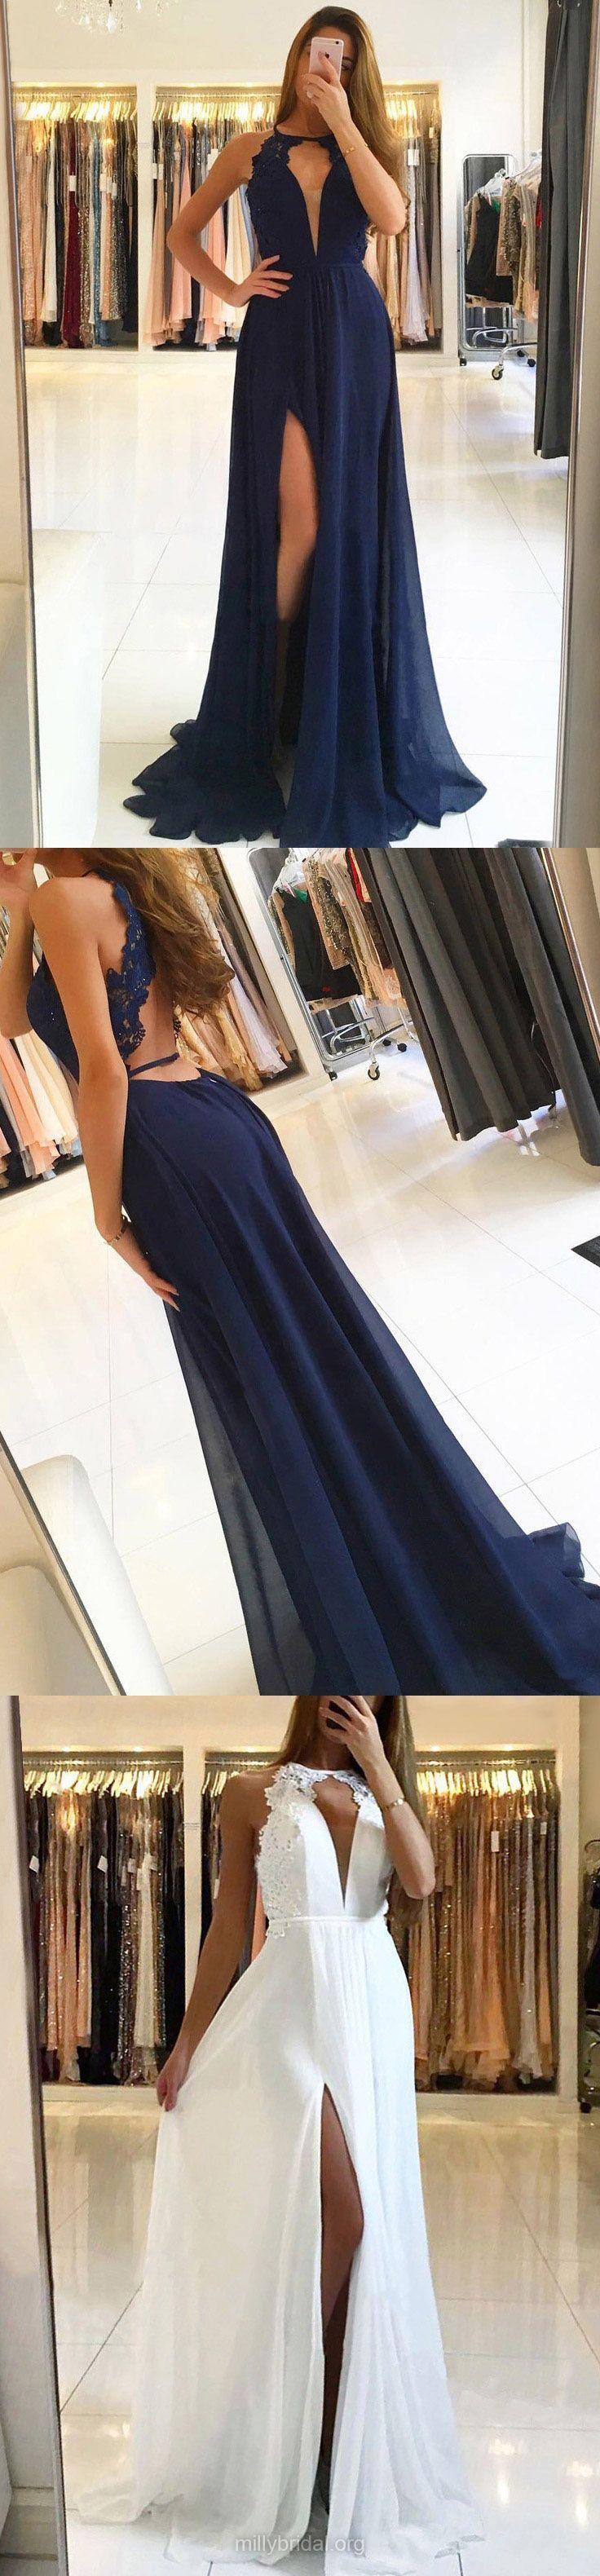 Navy blue prom dresses long prom dresses lace prom dresses